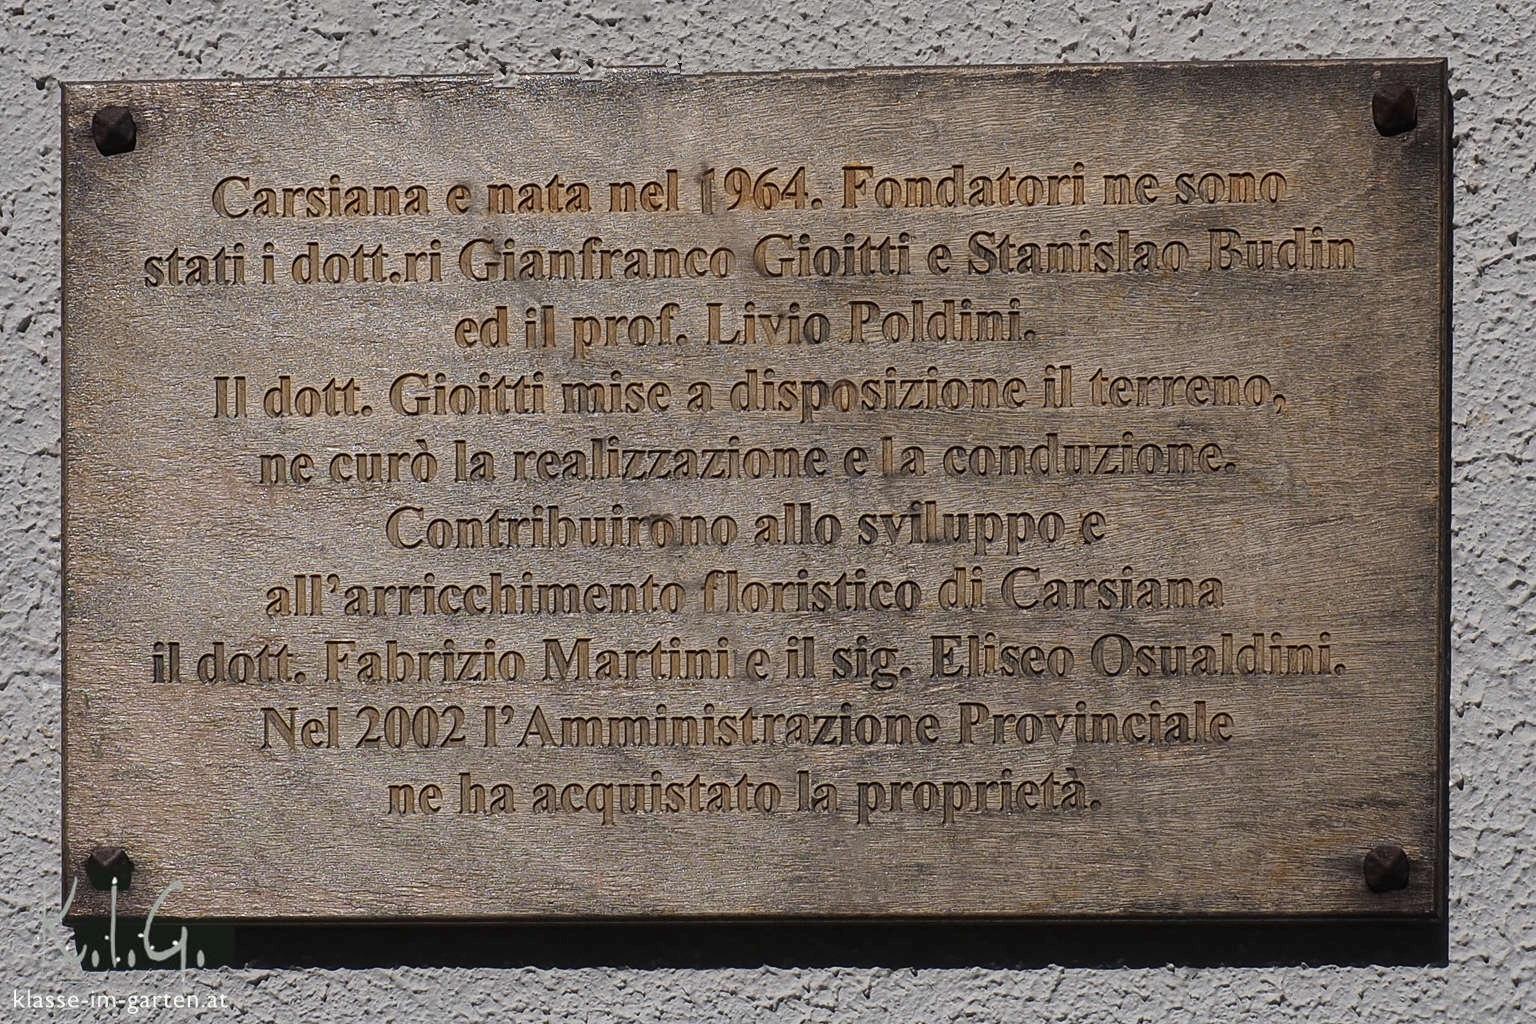 Giardino Botanico Carsiana- gegründet durch Privatinitative